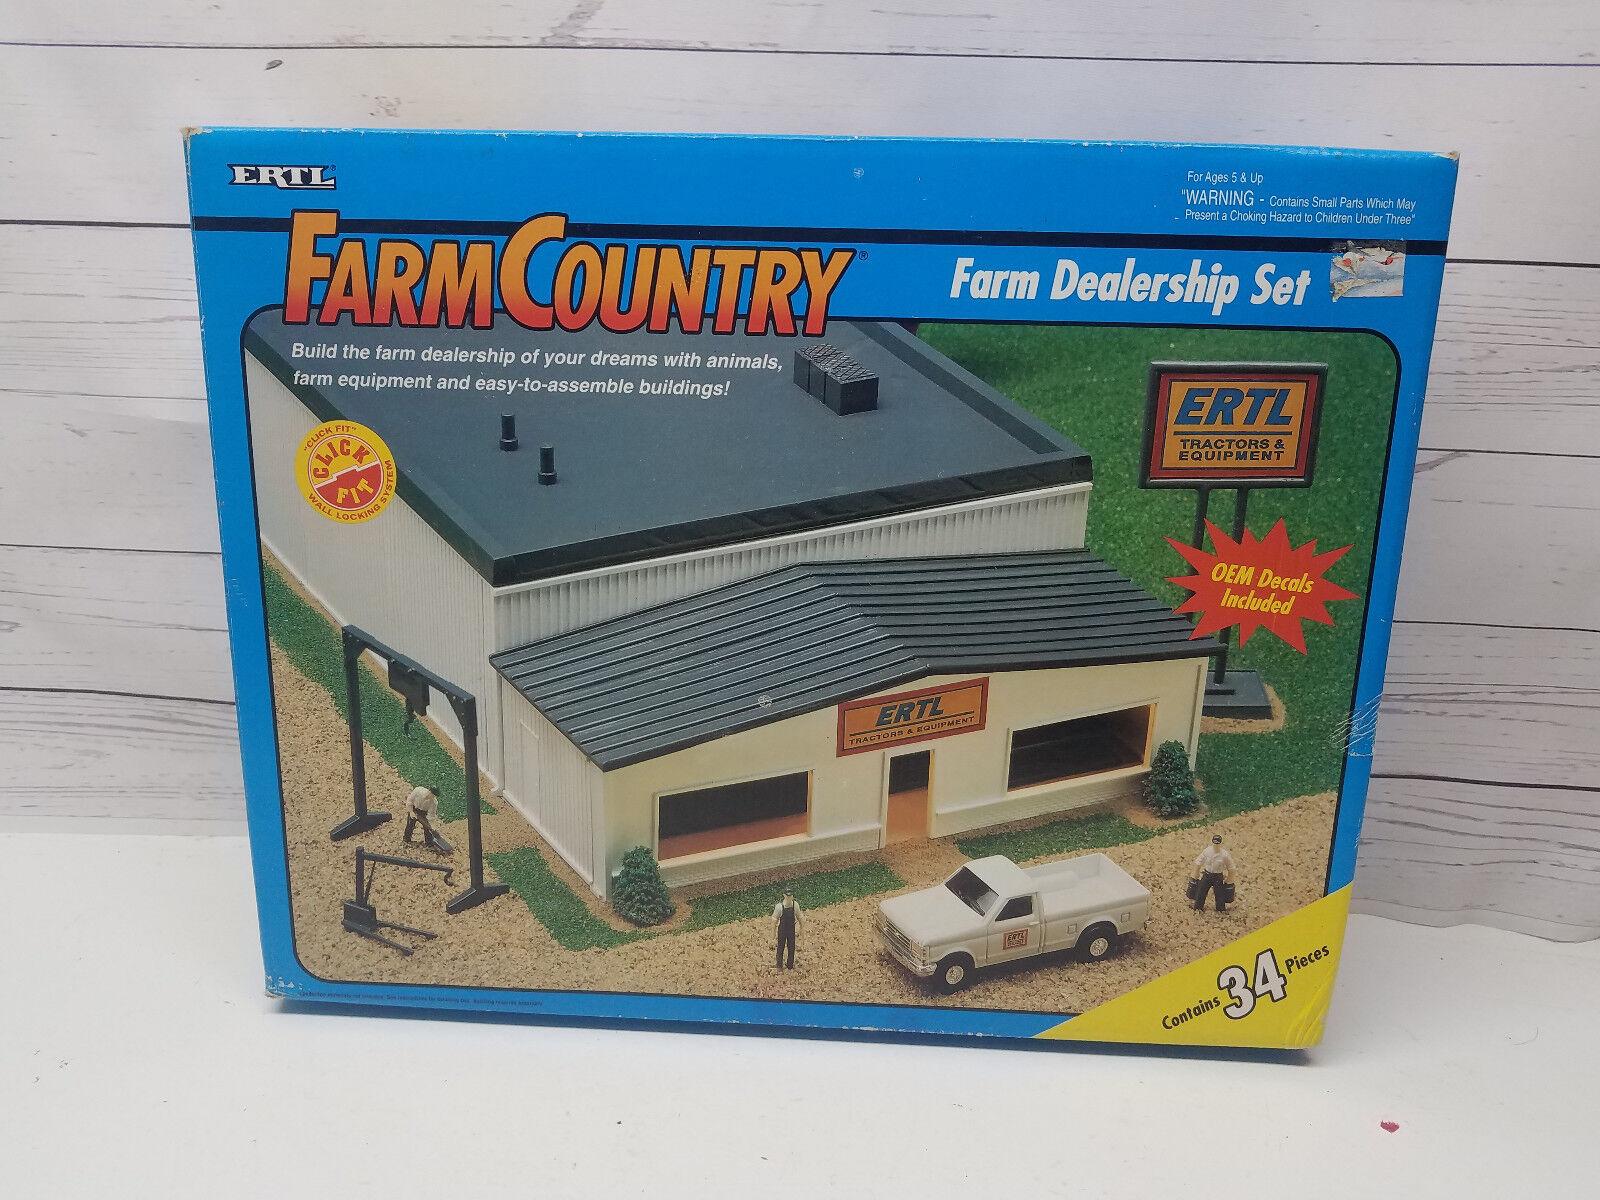 prima qualità ai consumatori Ertl Ertl Ertl Farm Country Farm Dealership Set 4231  80% di sconto